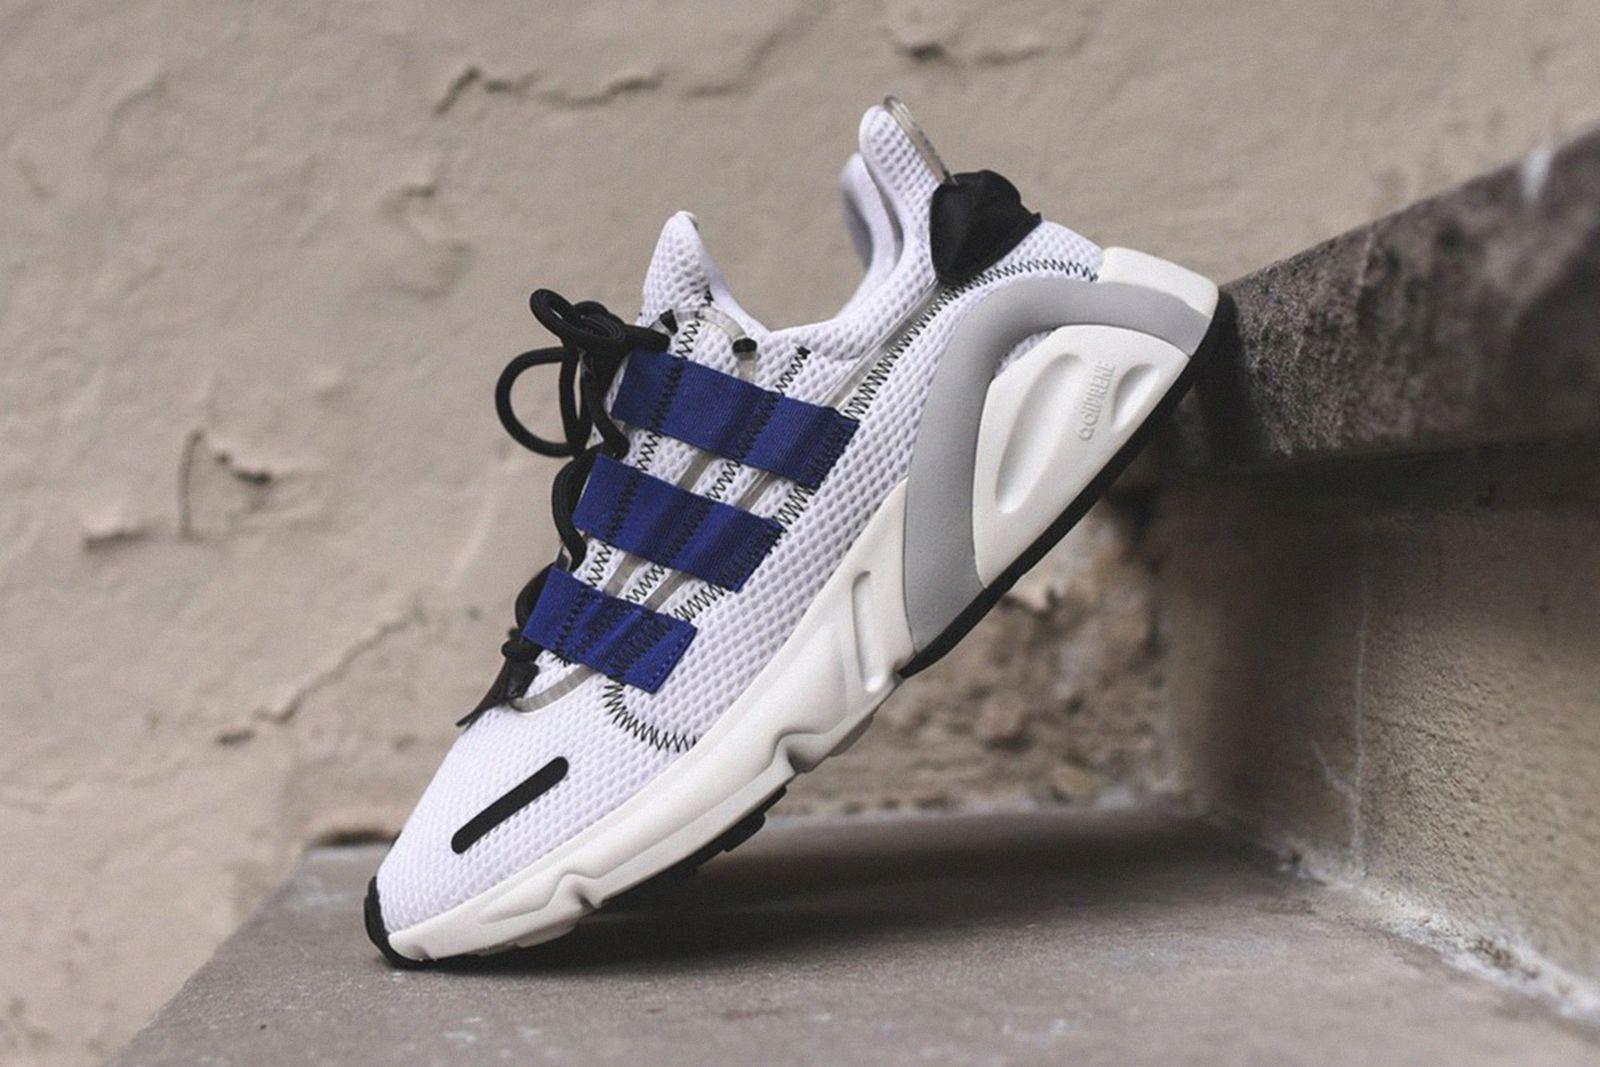 best adidas sneakers 2019 main adidas Originals